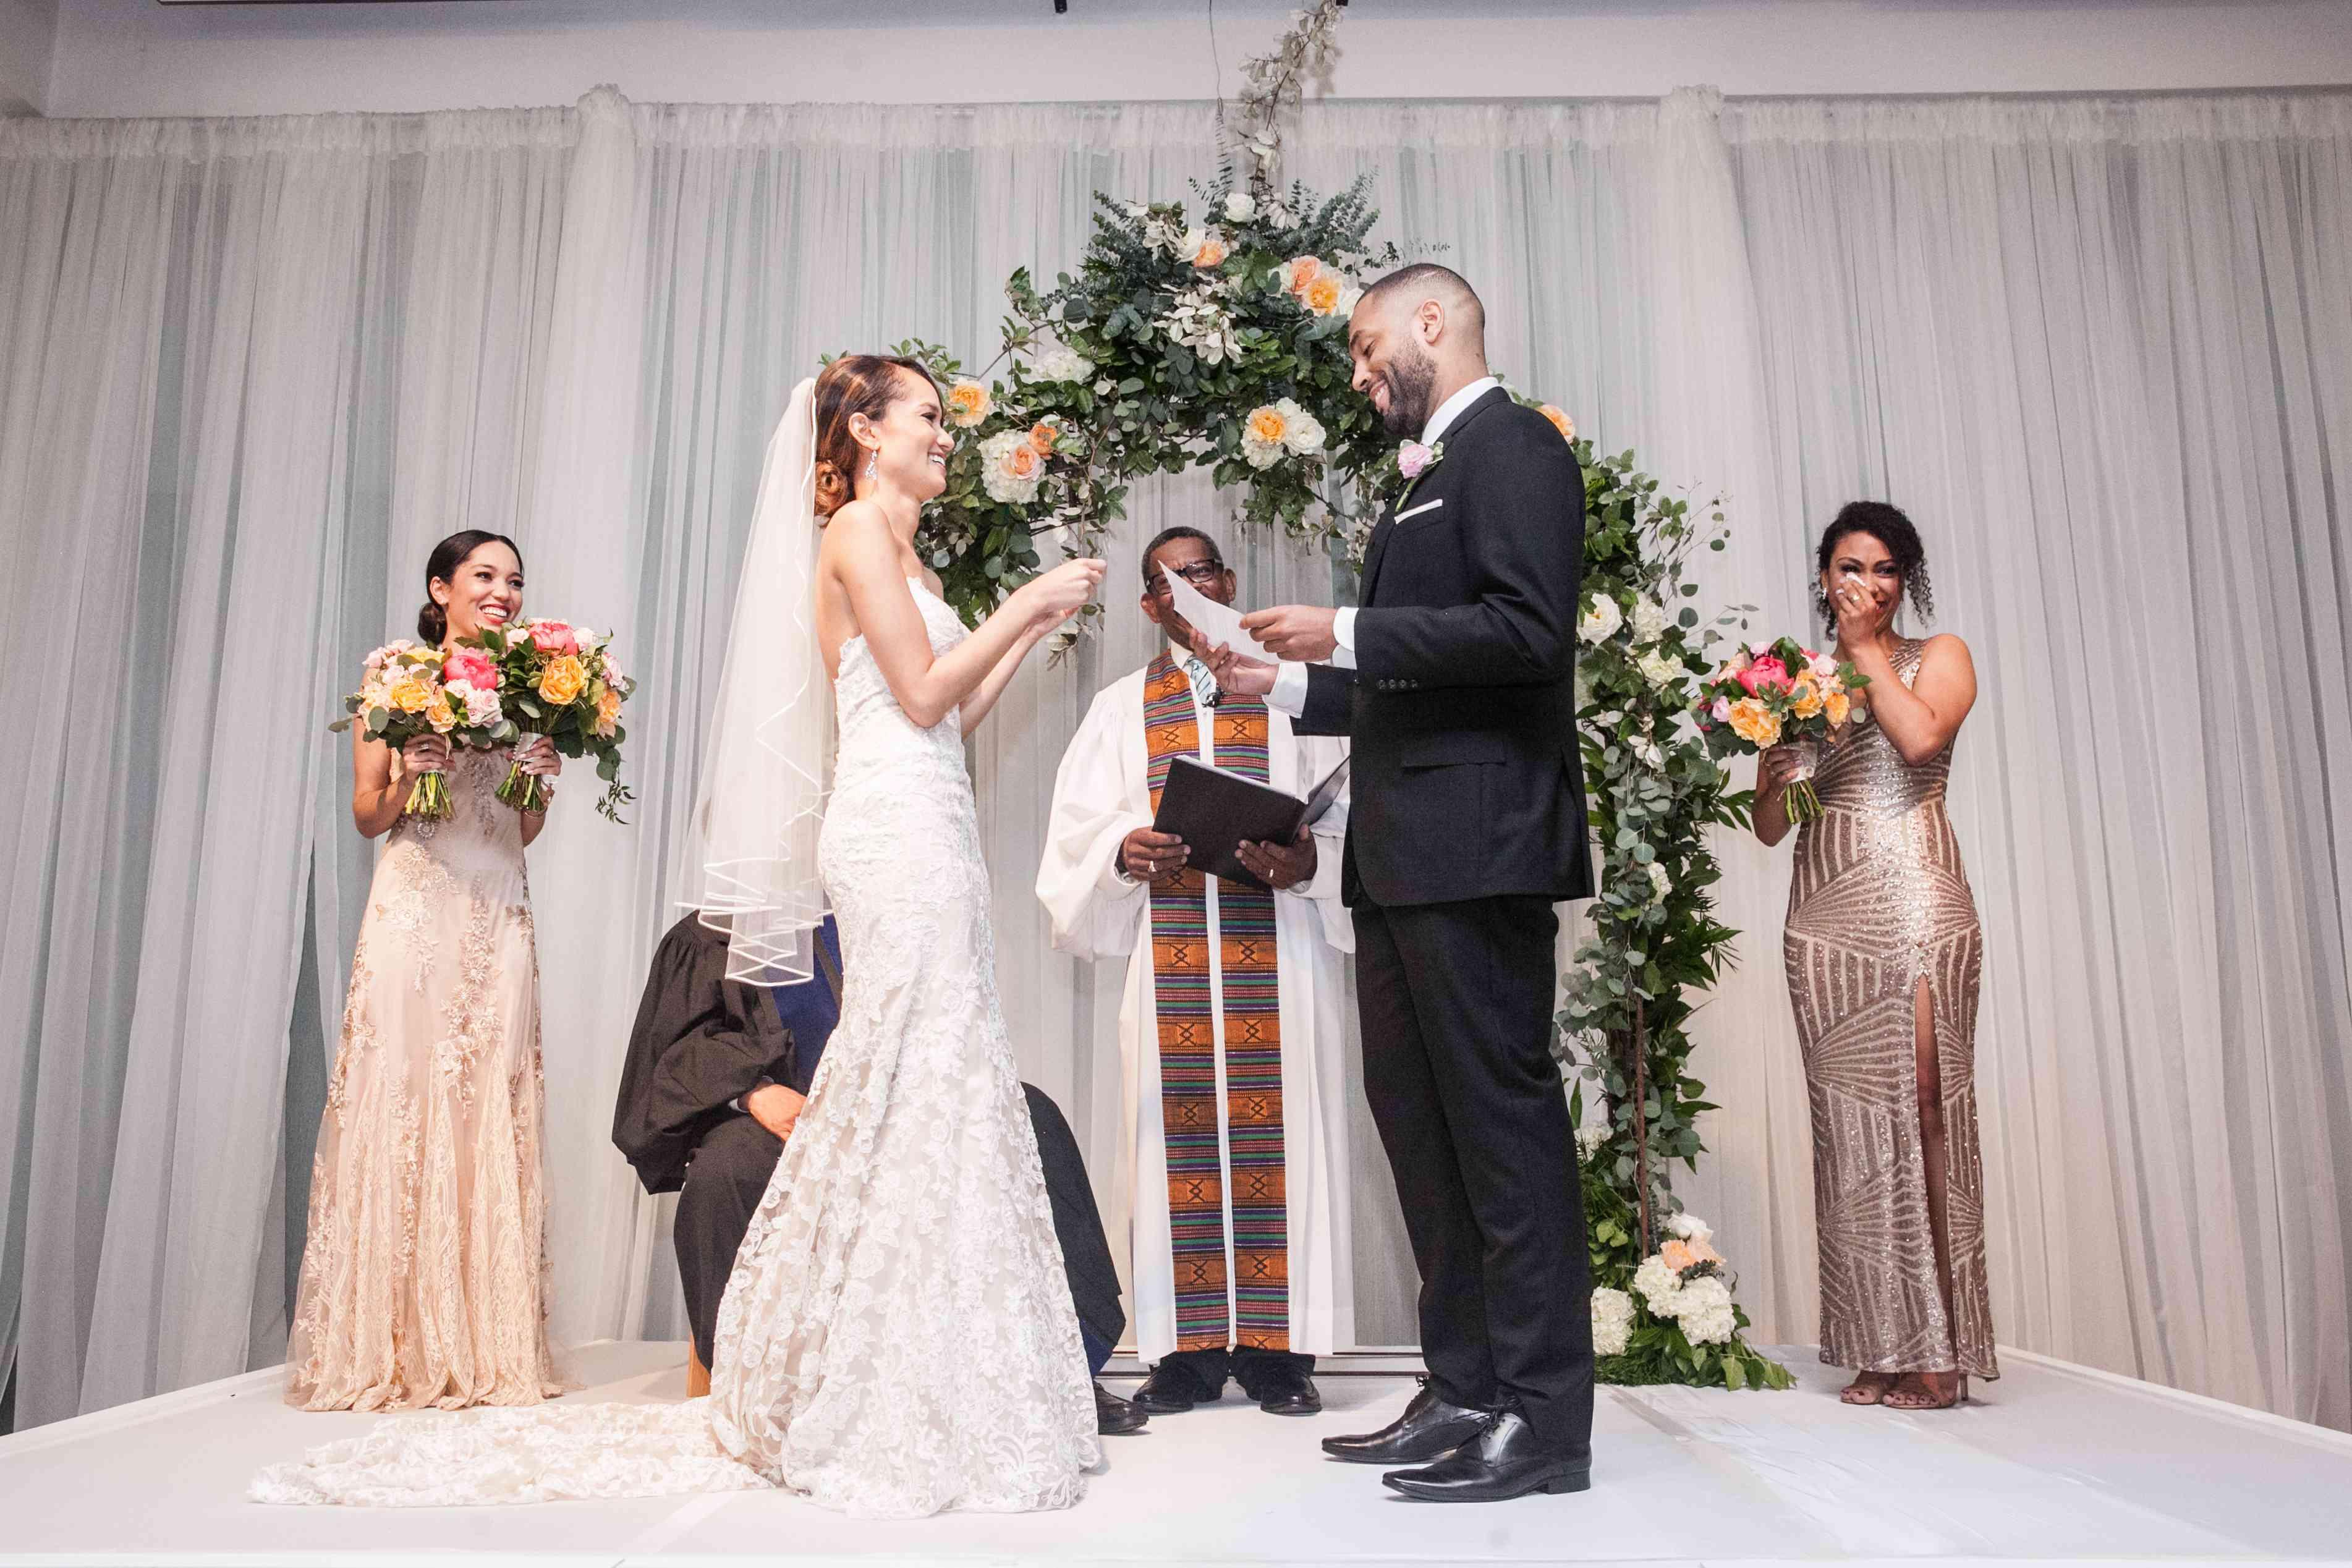 <p>Bride and Groom Exchange Vows</p><br><br>